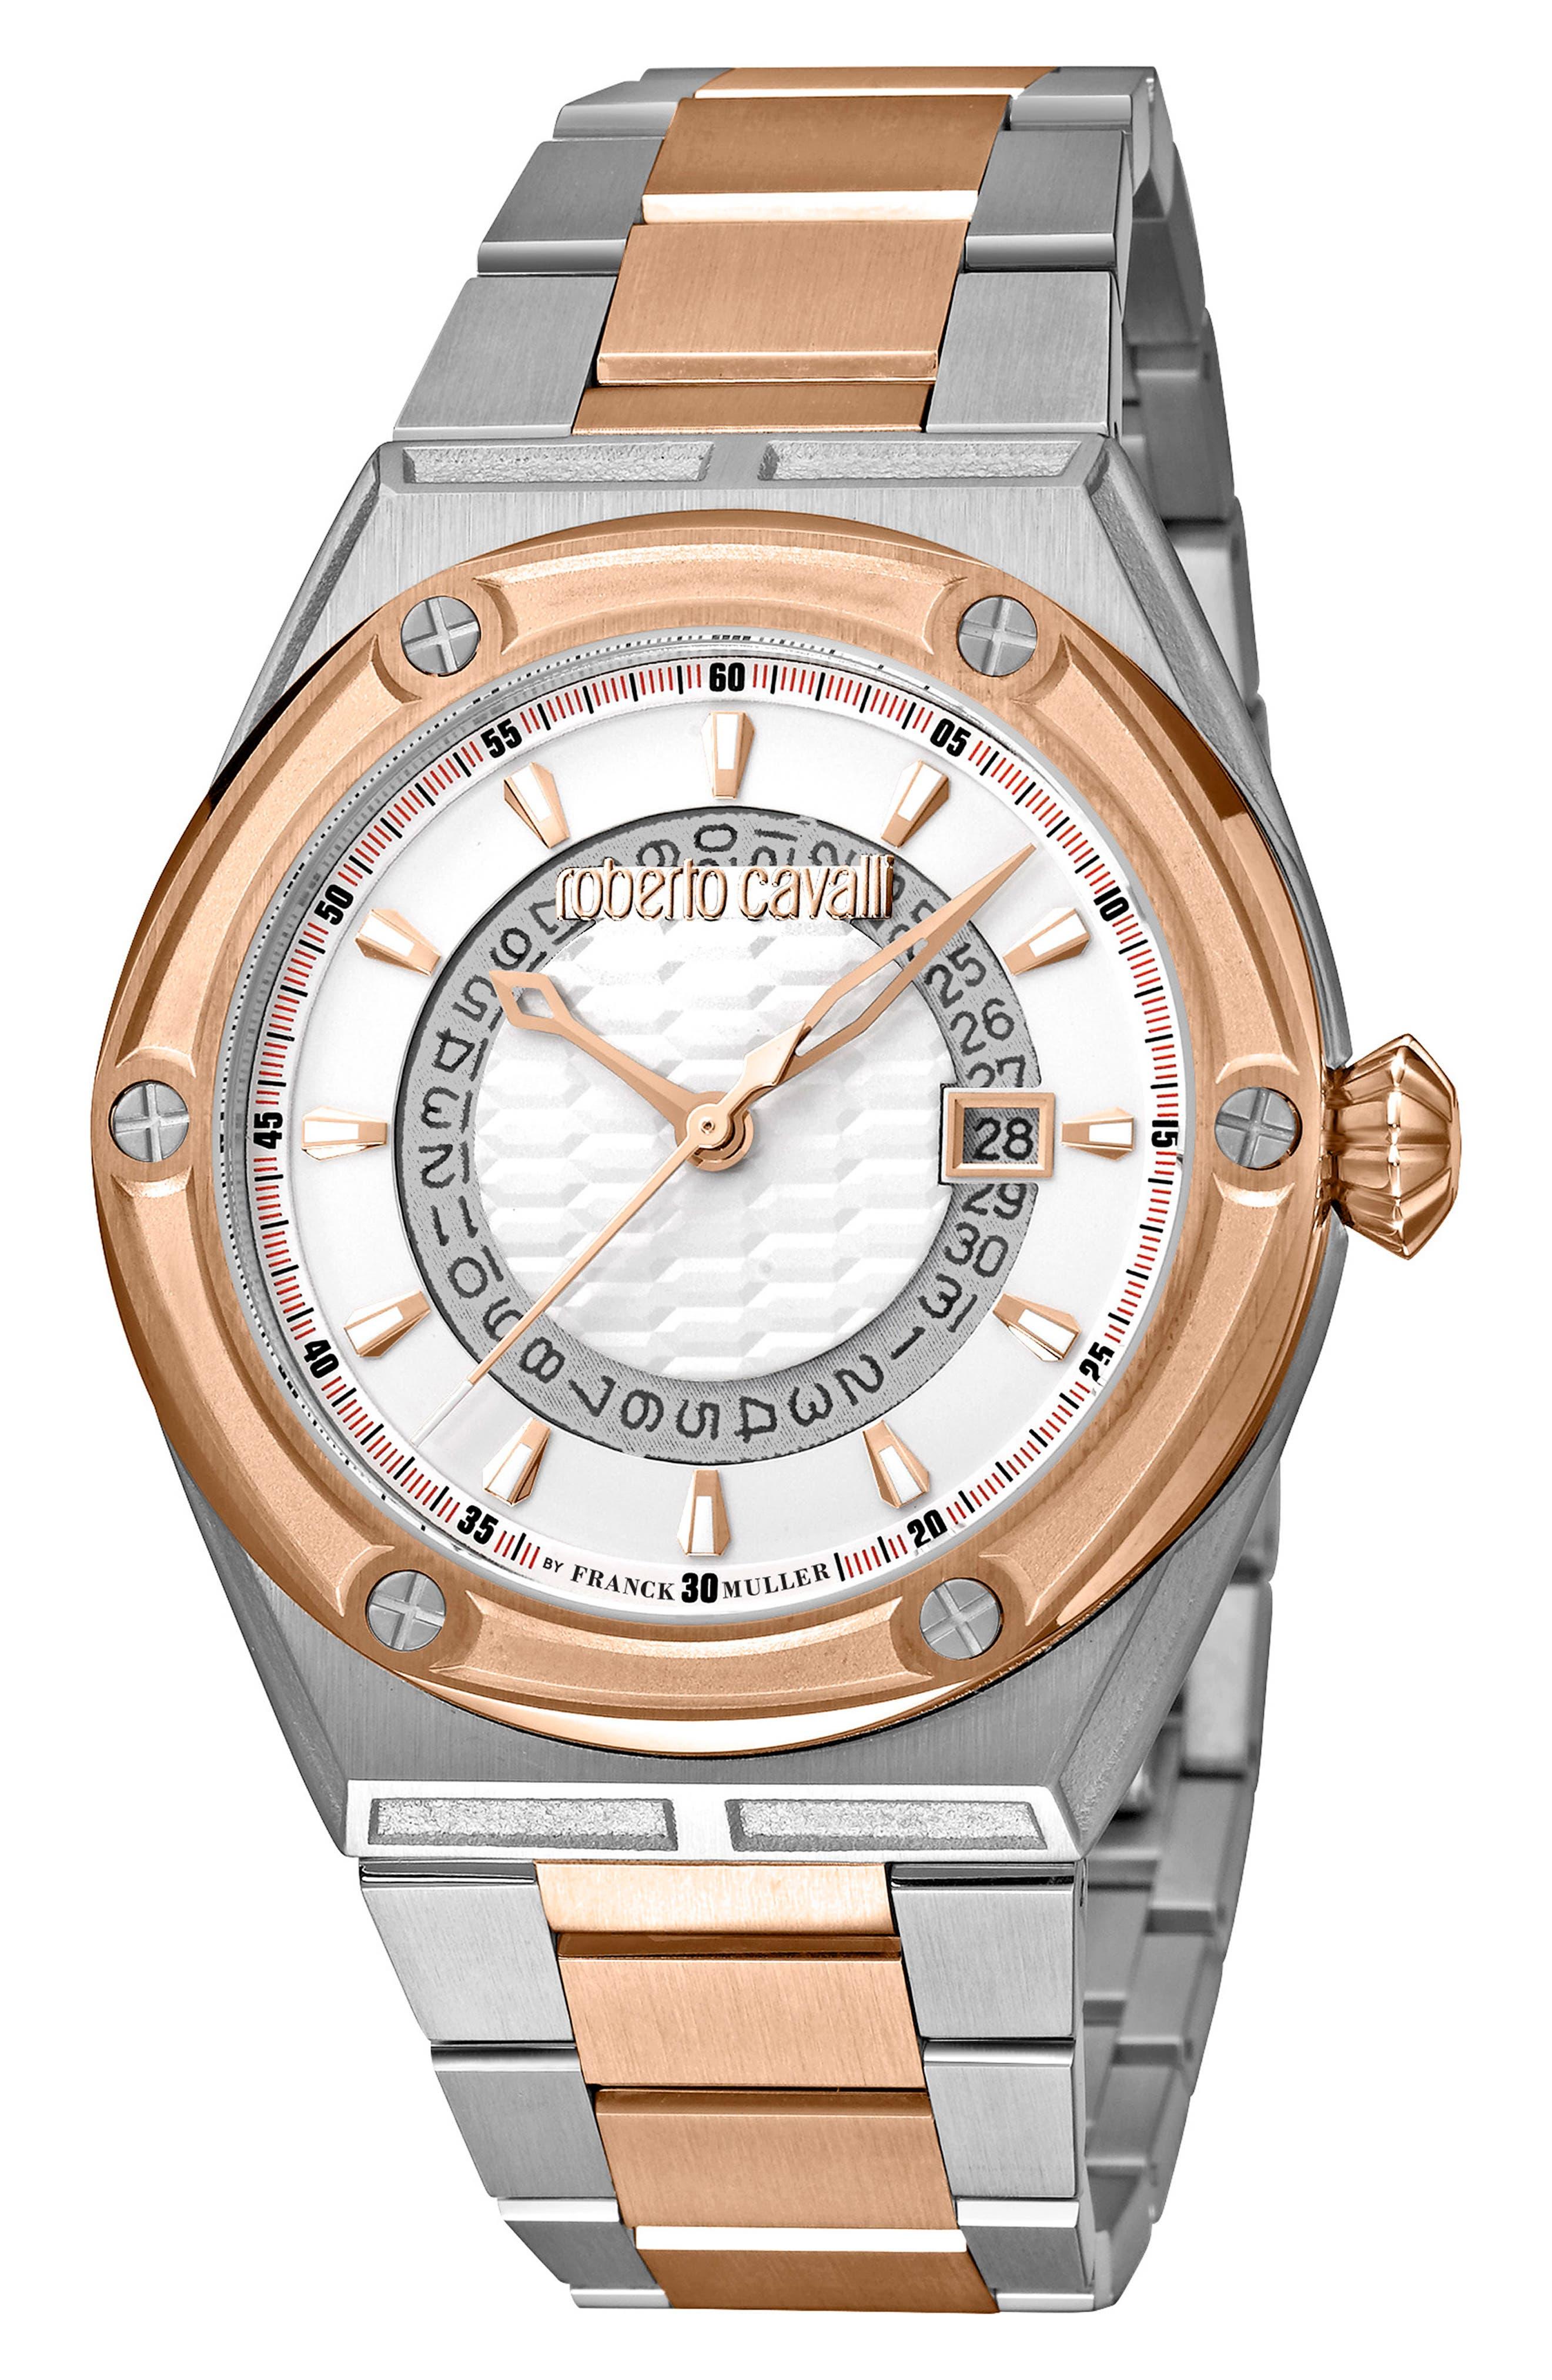 ROBERTO CAVALLI BY FRANCK MULLER Scala Bracelet Watch, 45Mm in Gold